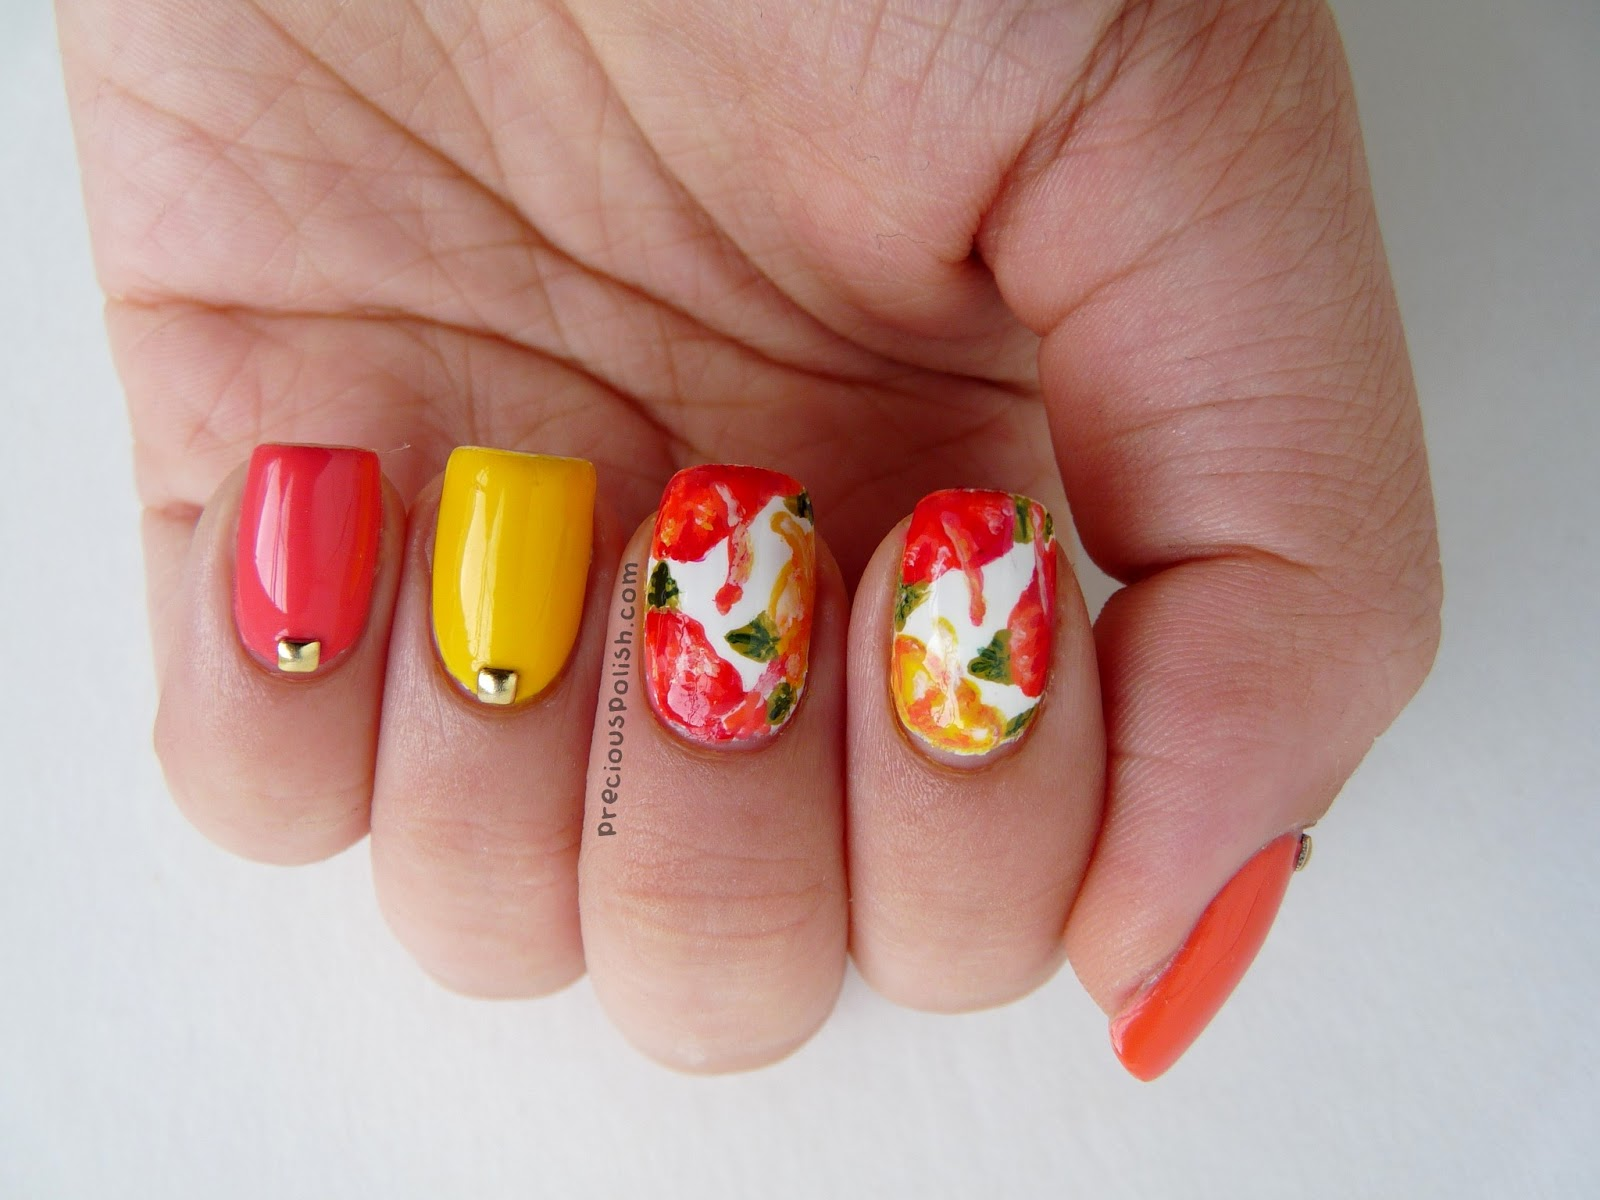 precious polish: Tutorial Tuesday: Hibiscus Flowers